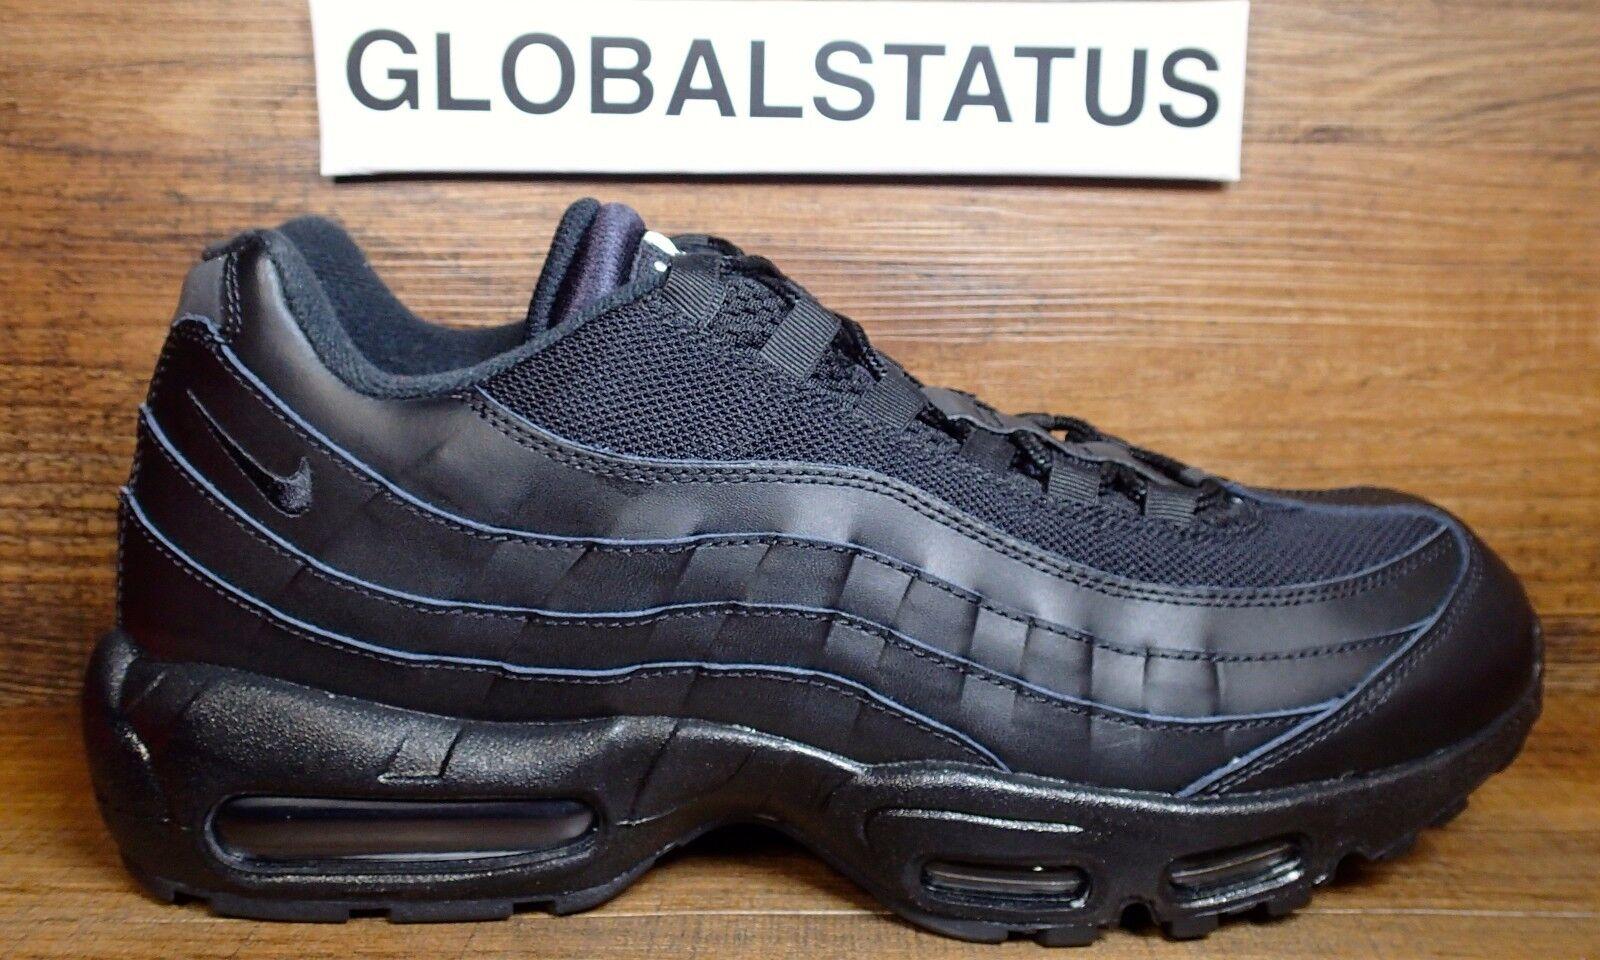 Nike air max 95 / id hiroshi fujiwara parker scarpe nere 865627 991 dimensioni